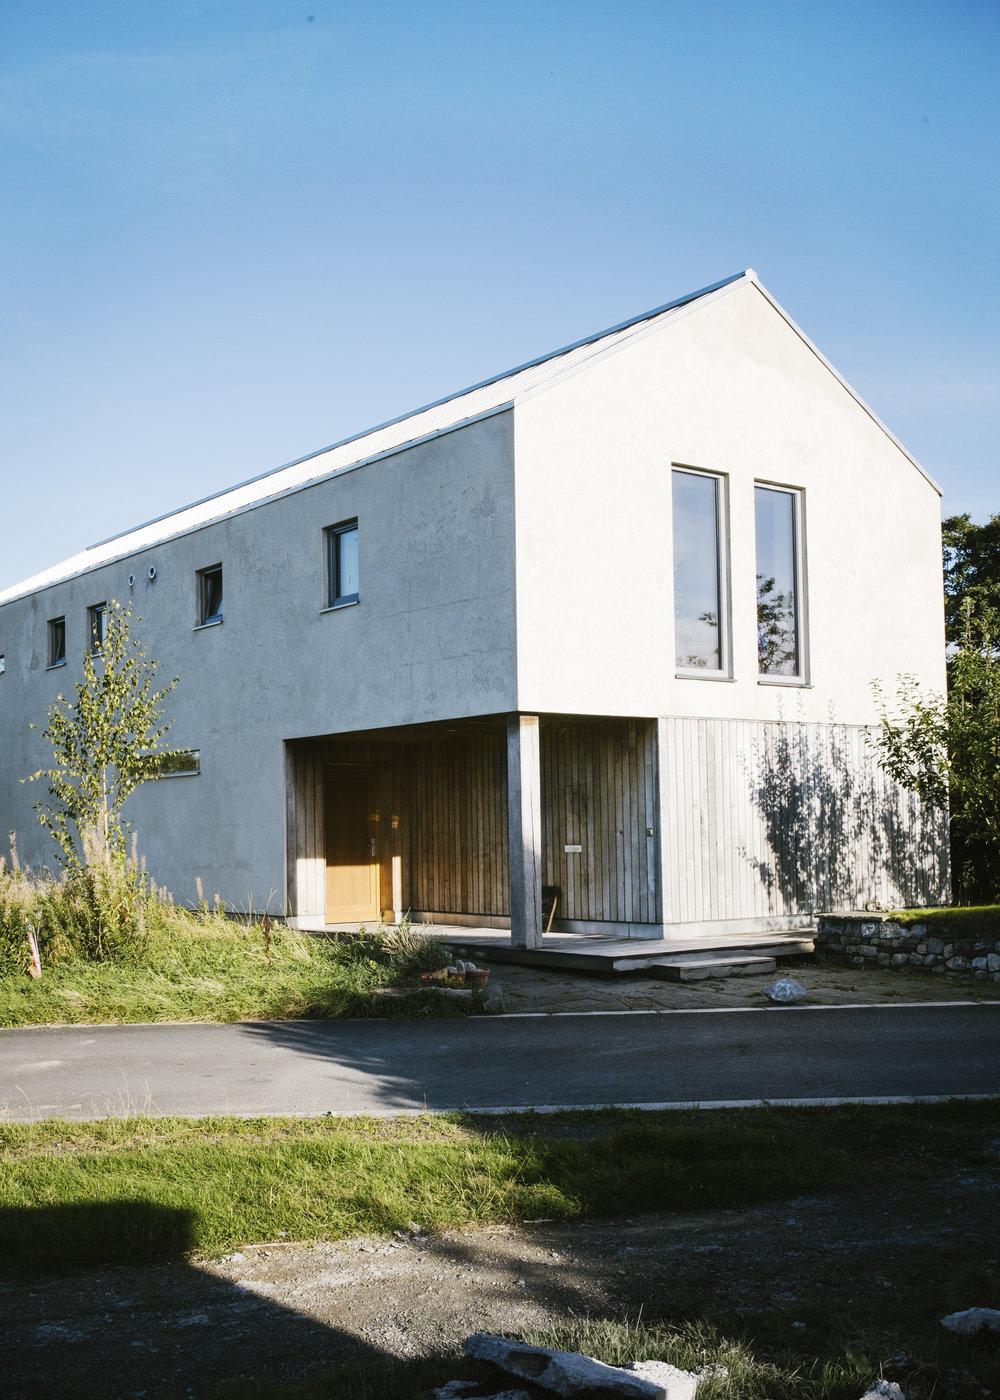 Eco Village Ireland - Suech and Beck